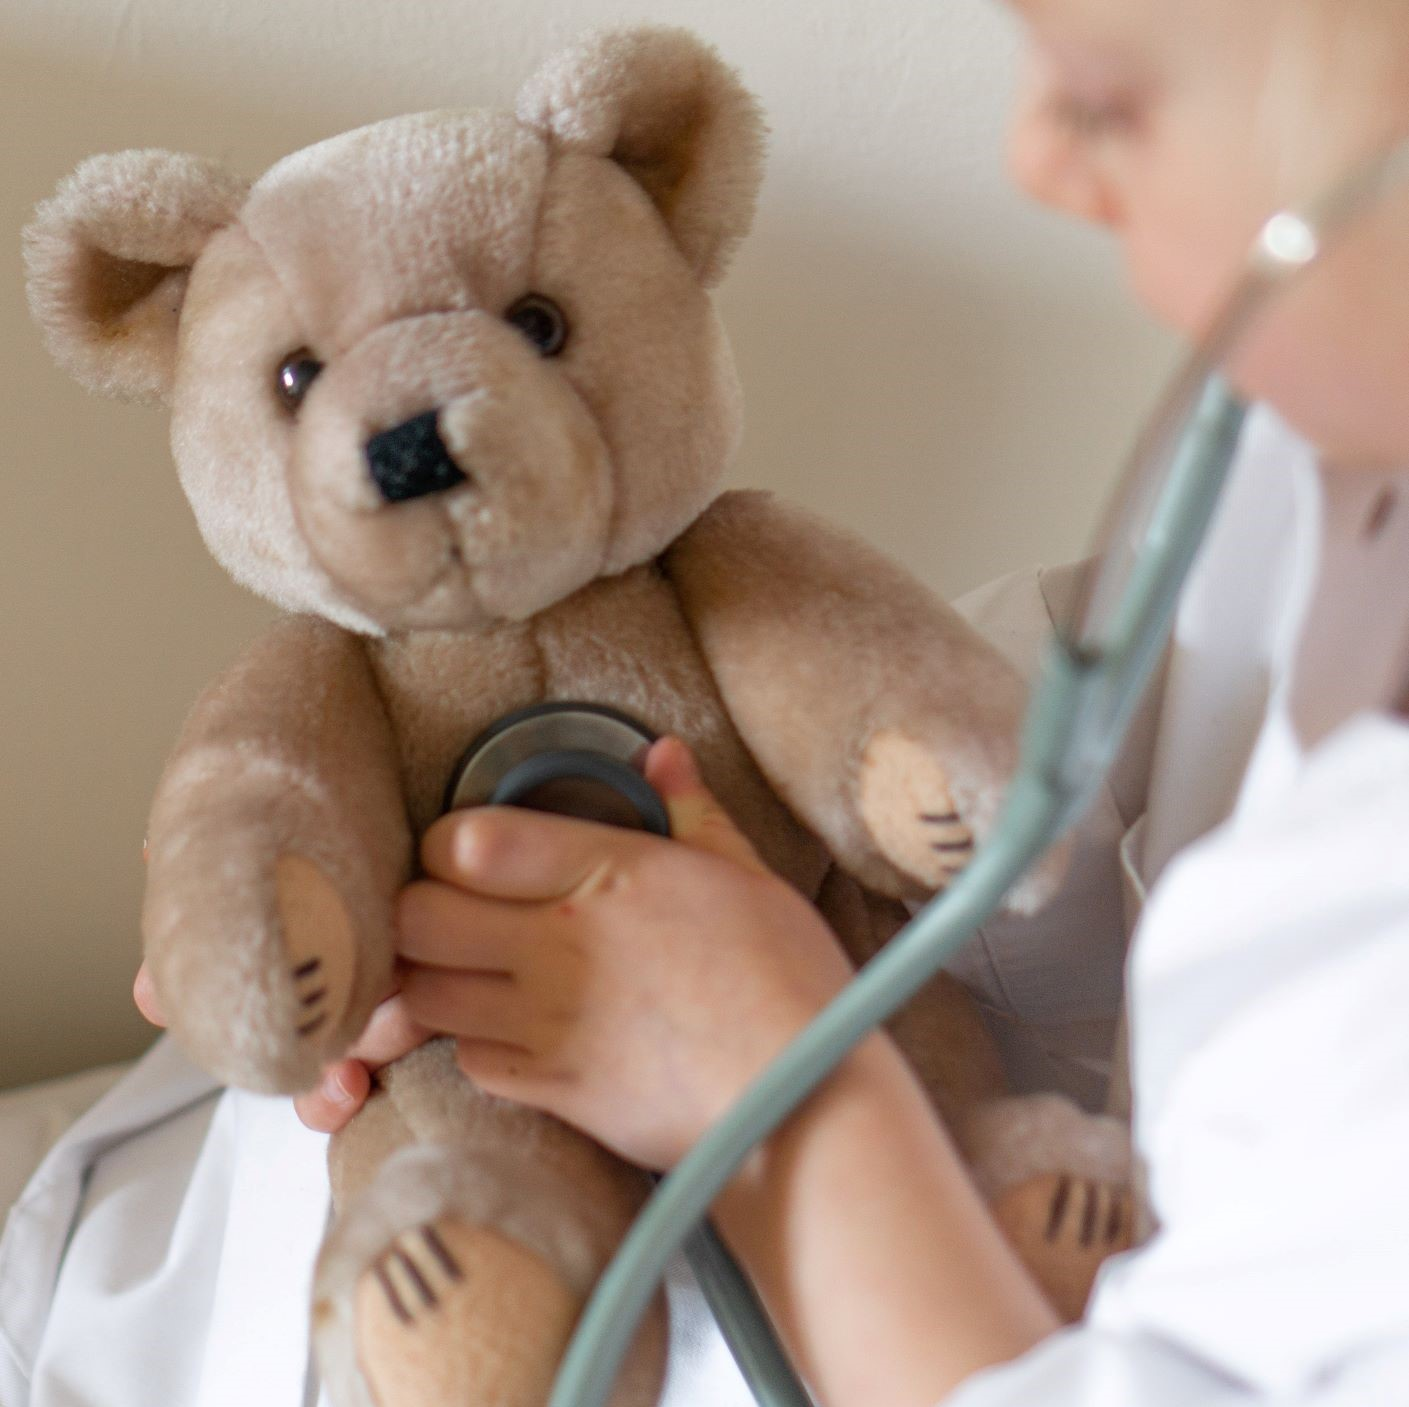 Heart murmur examination on teddy bear